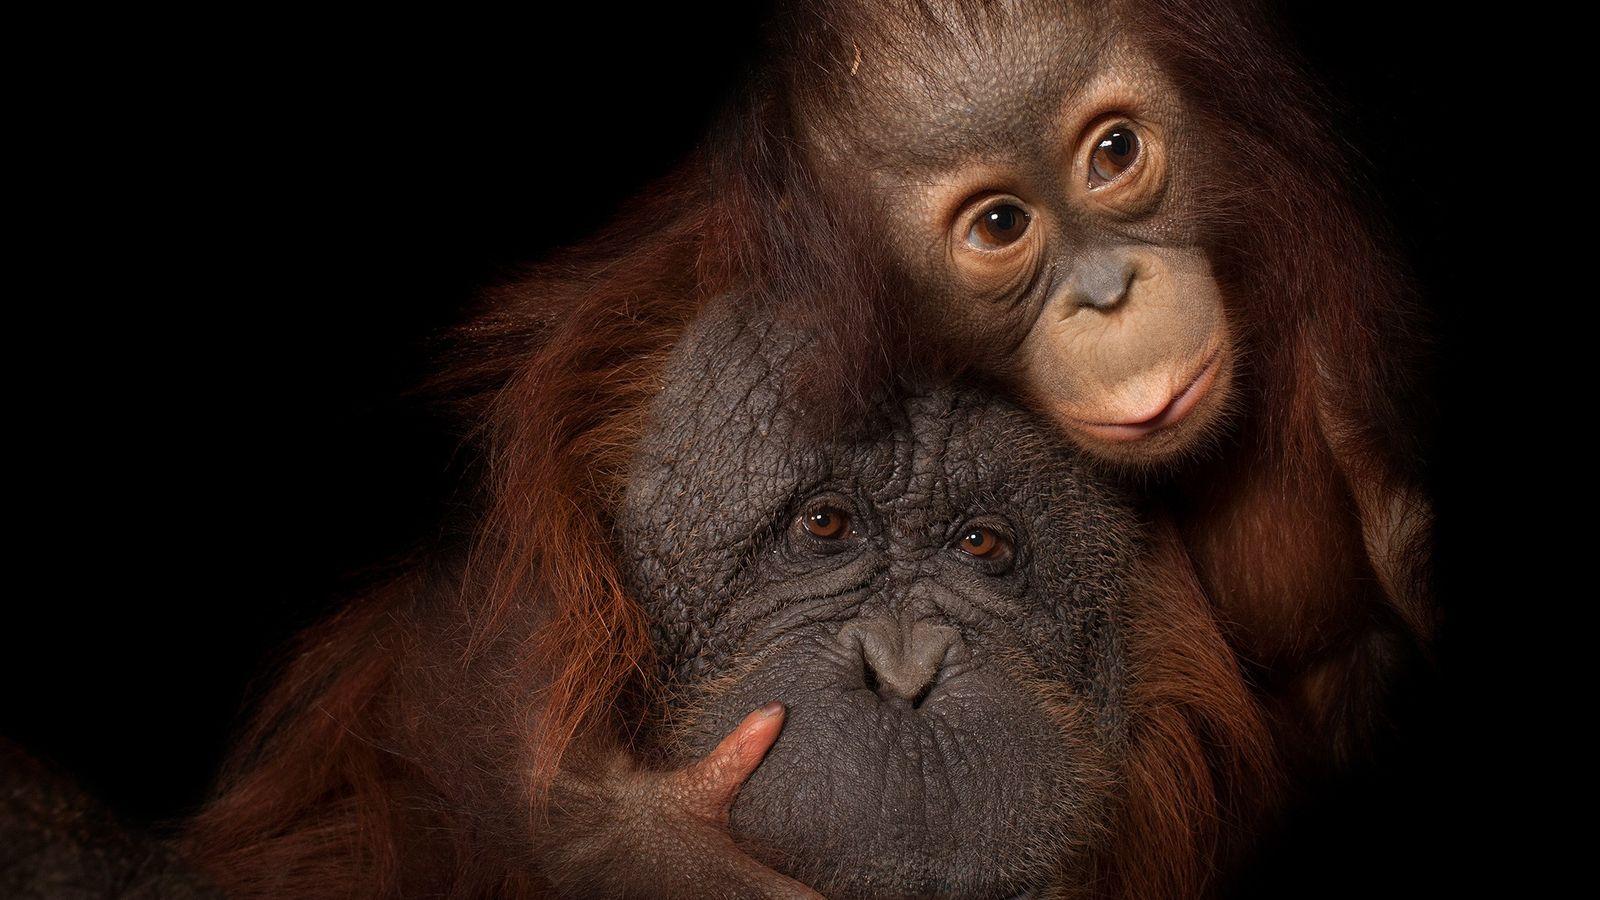 While baby orangutan Aurora snuggles with adoptive mom Cheyenne at the Houston Zoo, deforestation and poaching ...